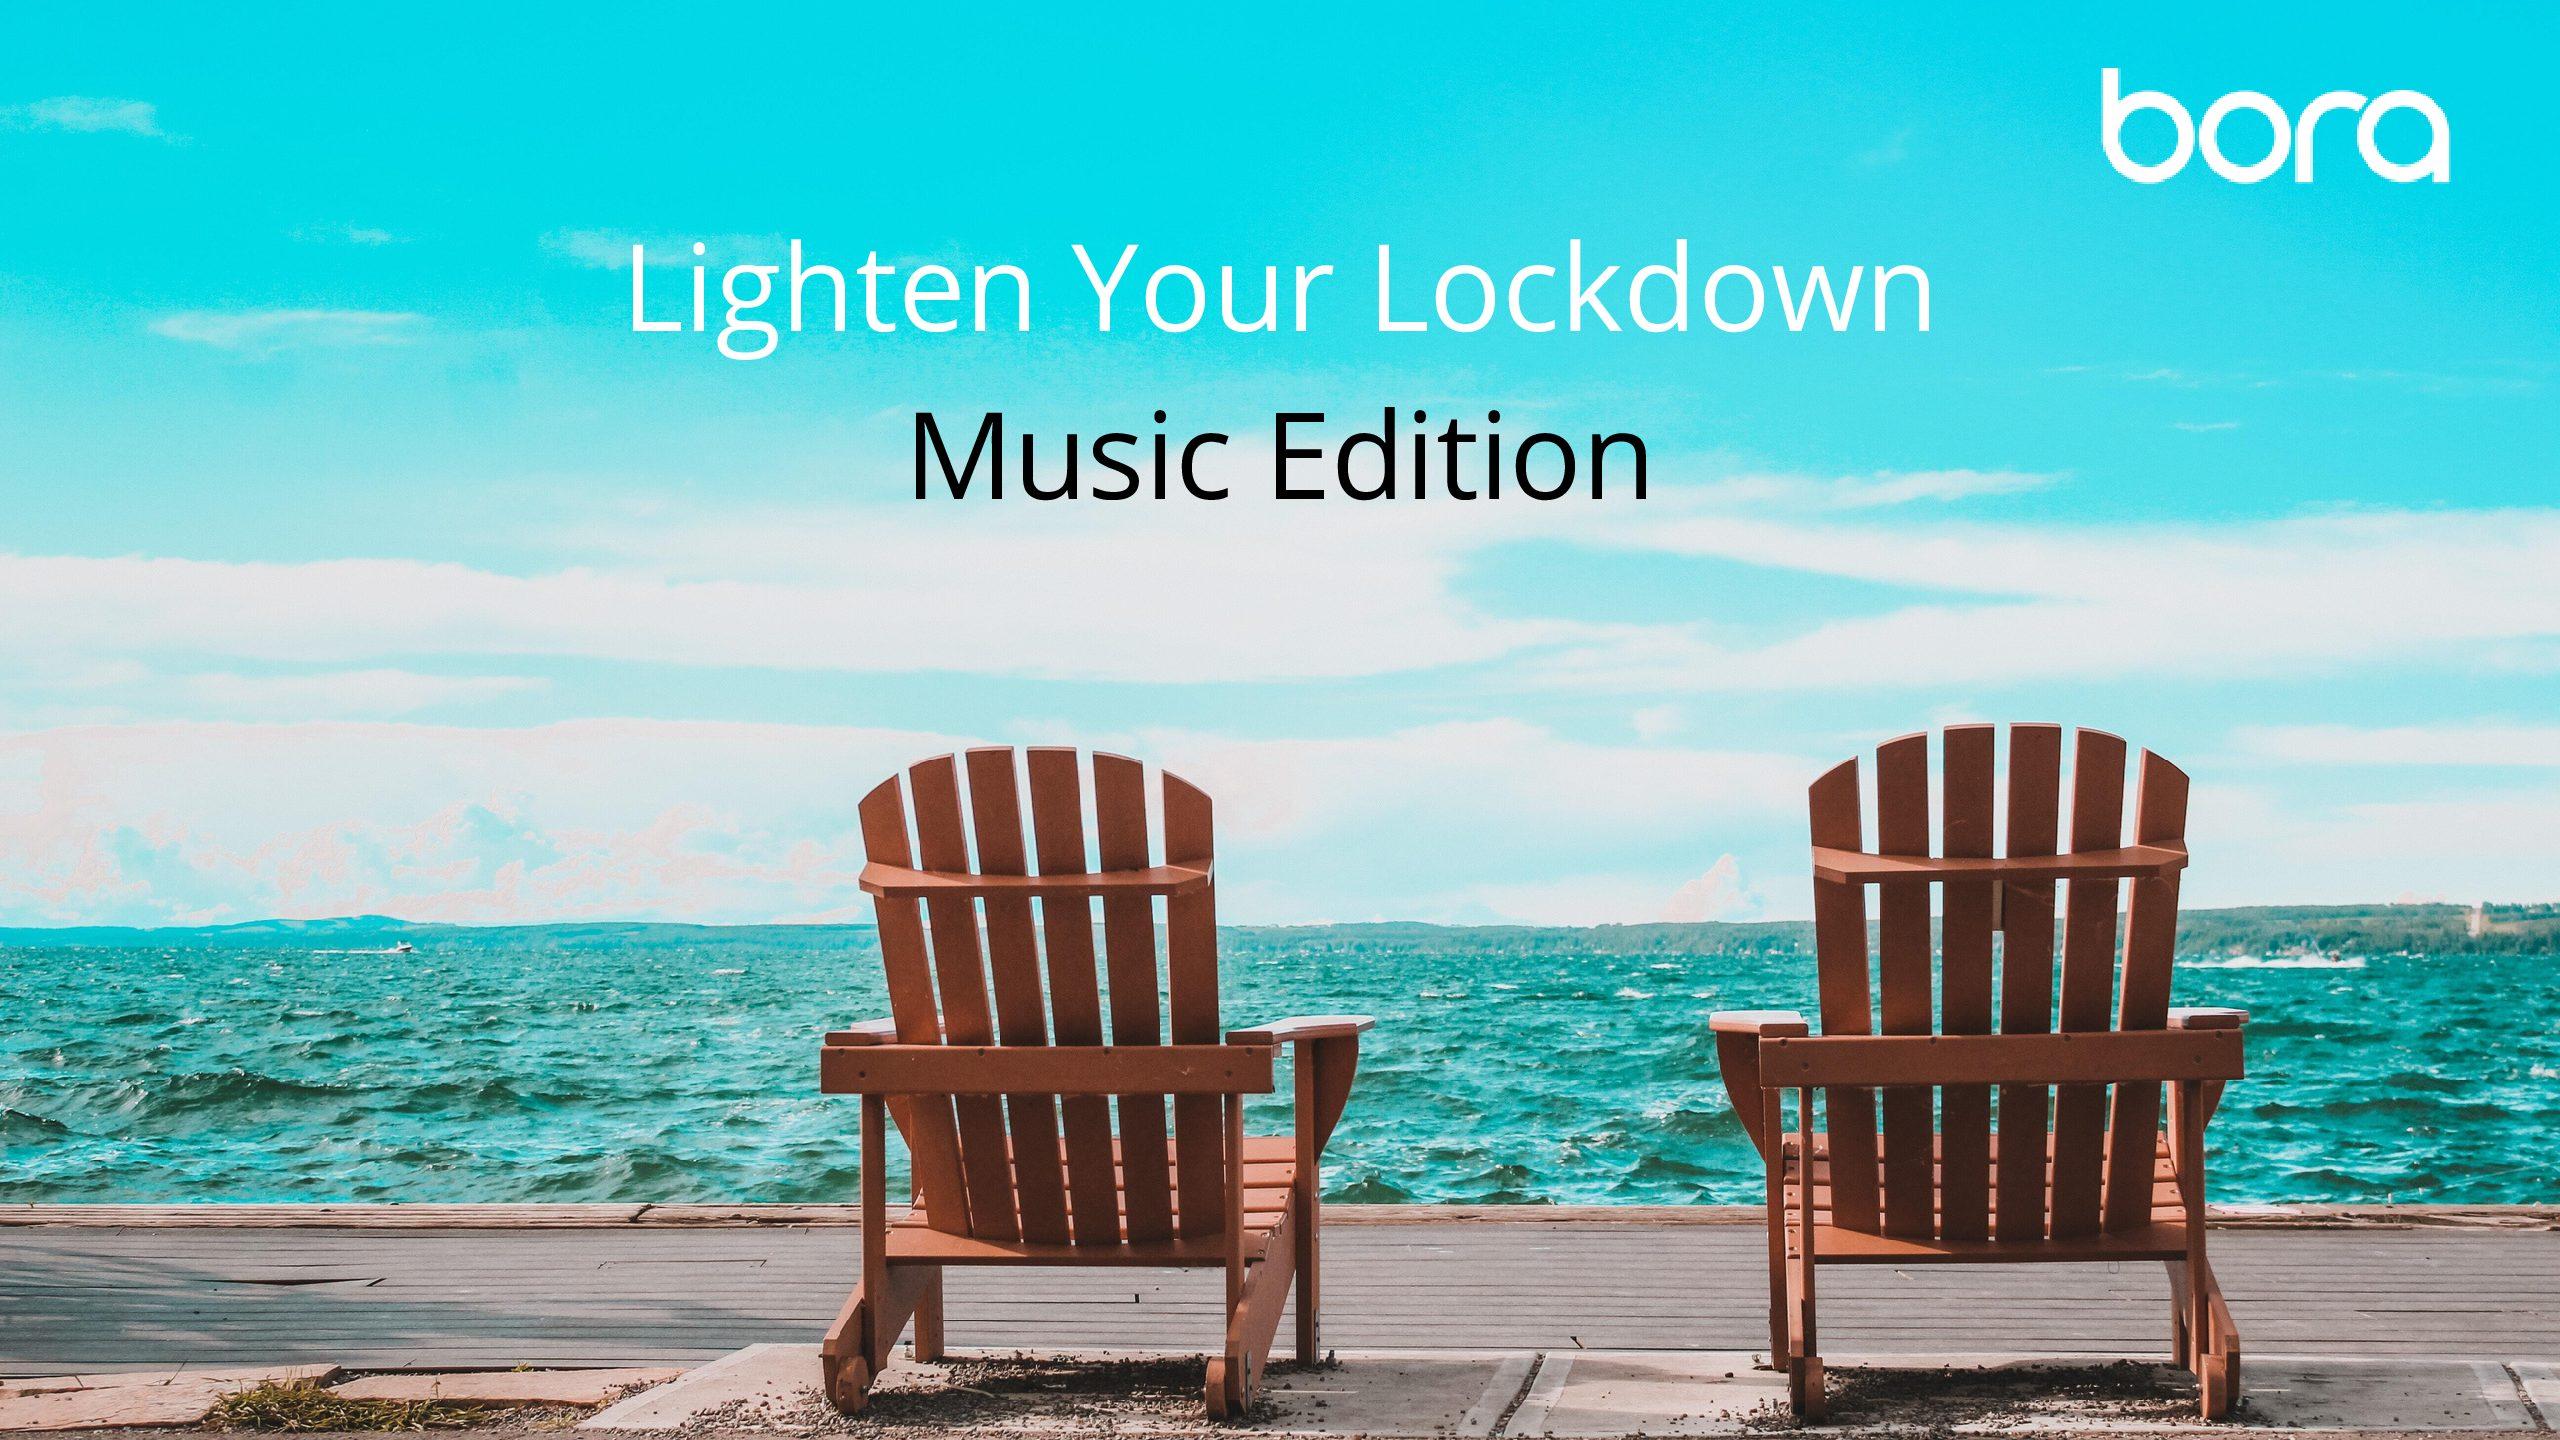 Lighten Your Lockdown: Music Edition